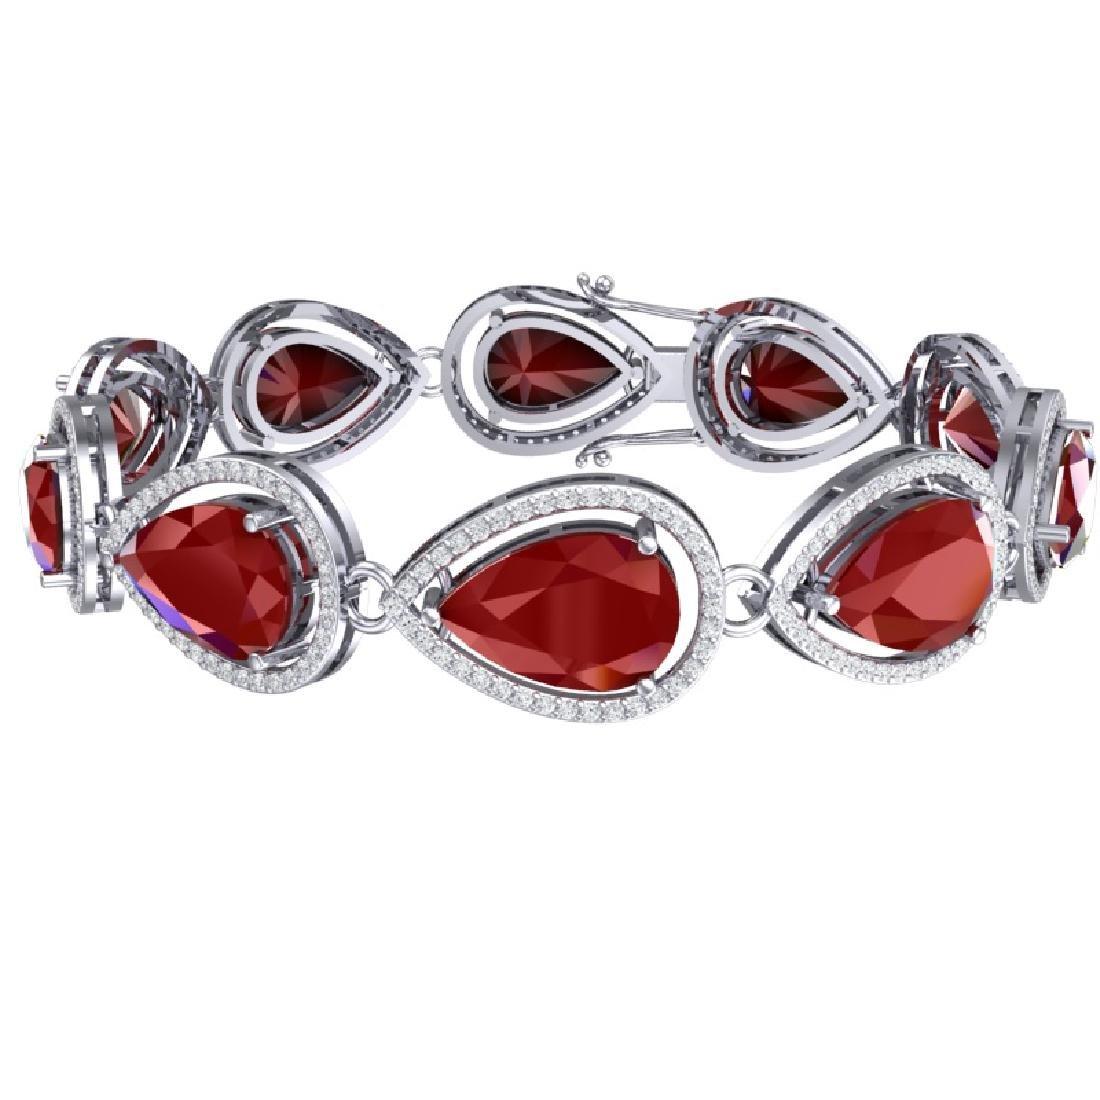 28.31 CTW Royalty Ruby & VS Diamond Bracelet 18K White - 3